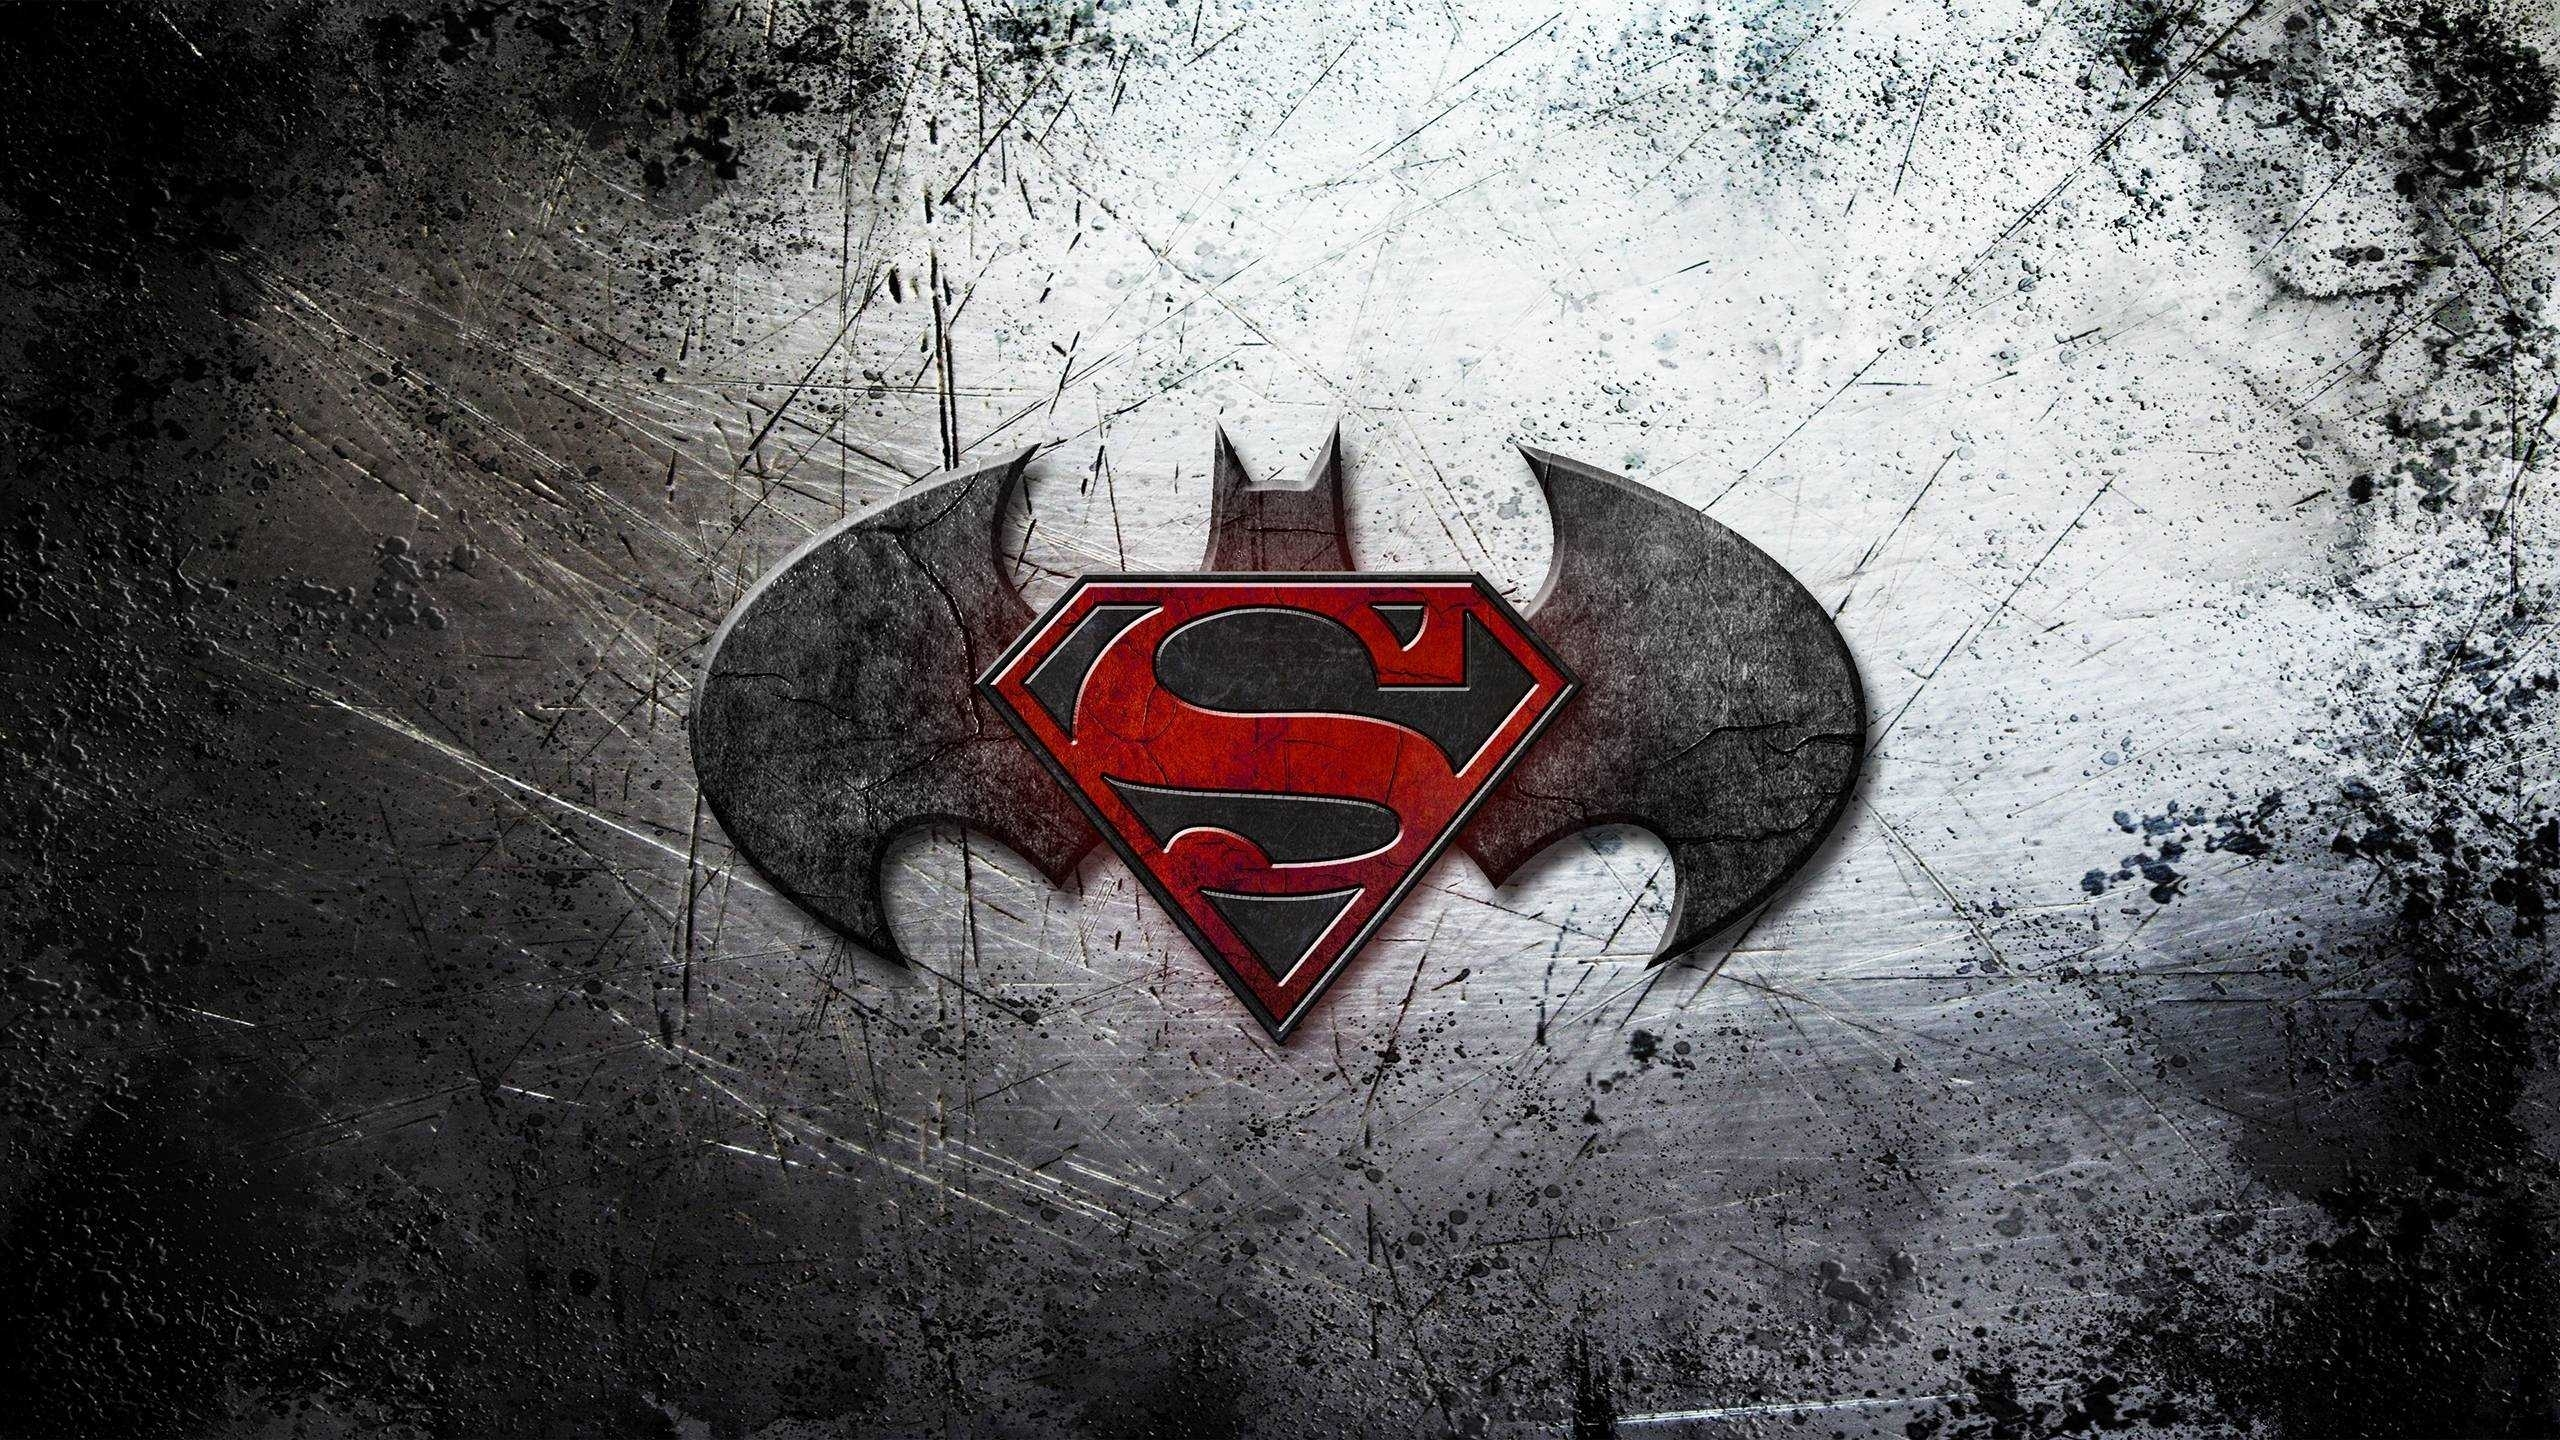 10 Latest Batman V Superman Hd Wallpaper Full Hd 1920 1080 For Pc